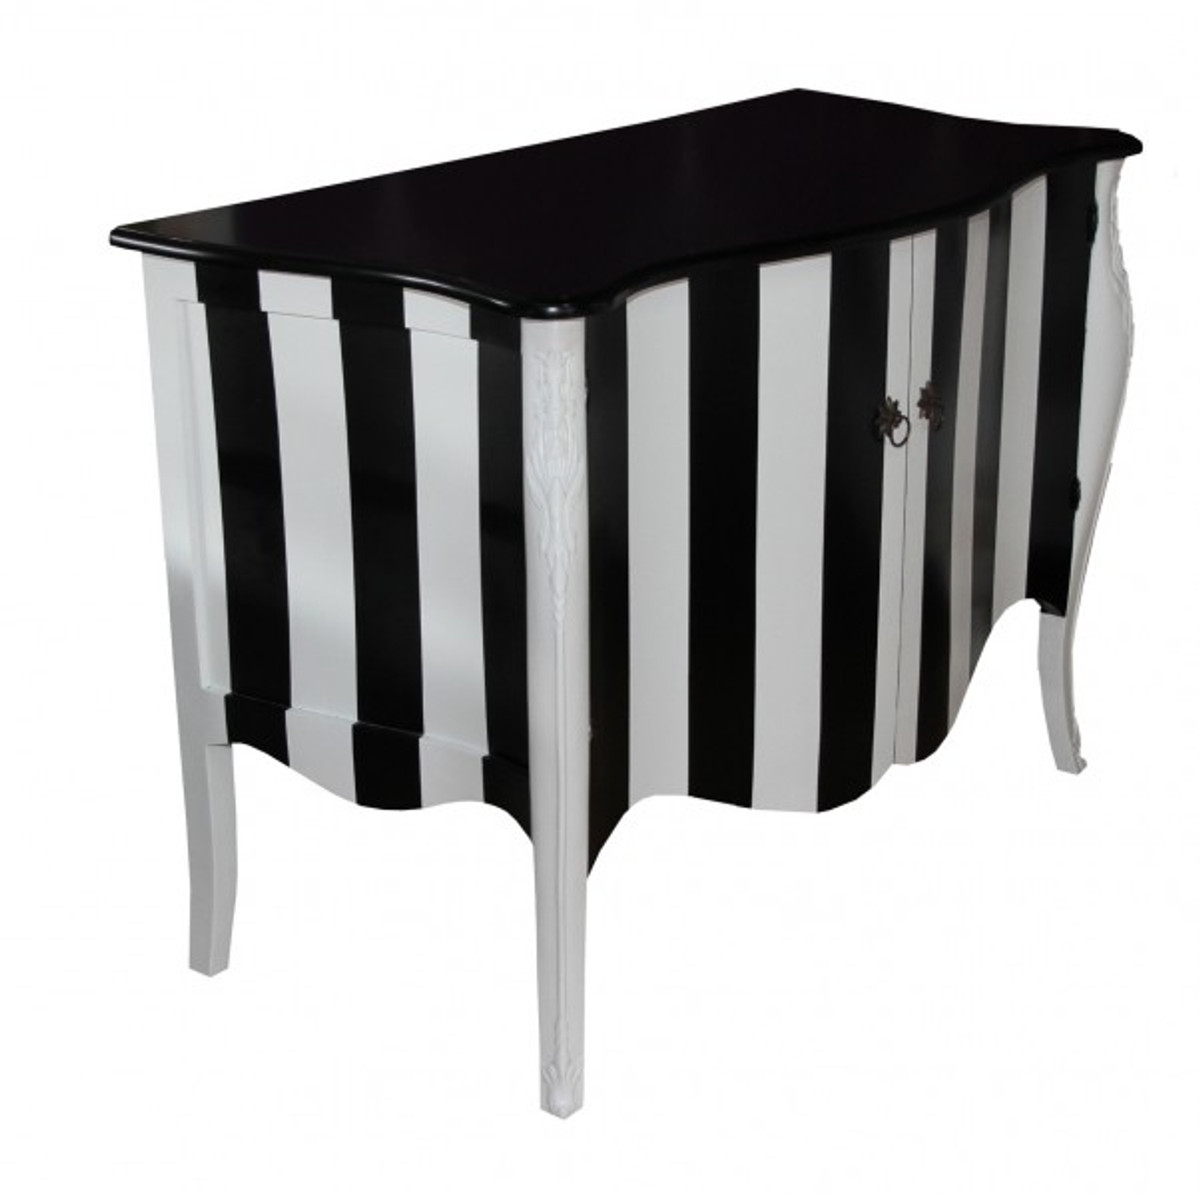 Kommode schwarz weiß  Casa Padrino Barock Kommode Schwarz/Weiß Streifen 120cm Mod ...